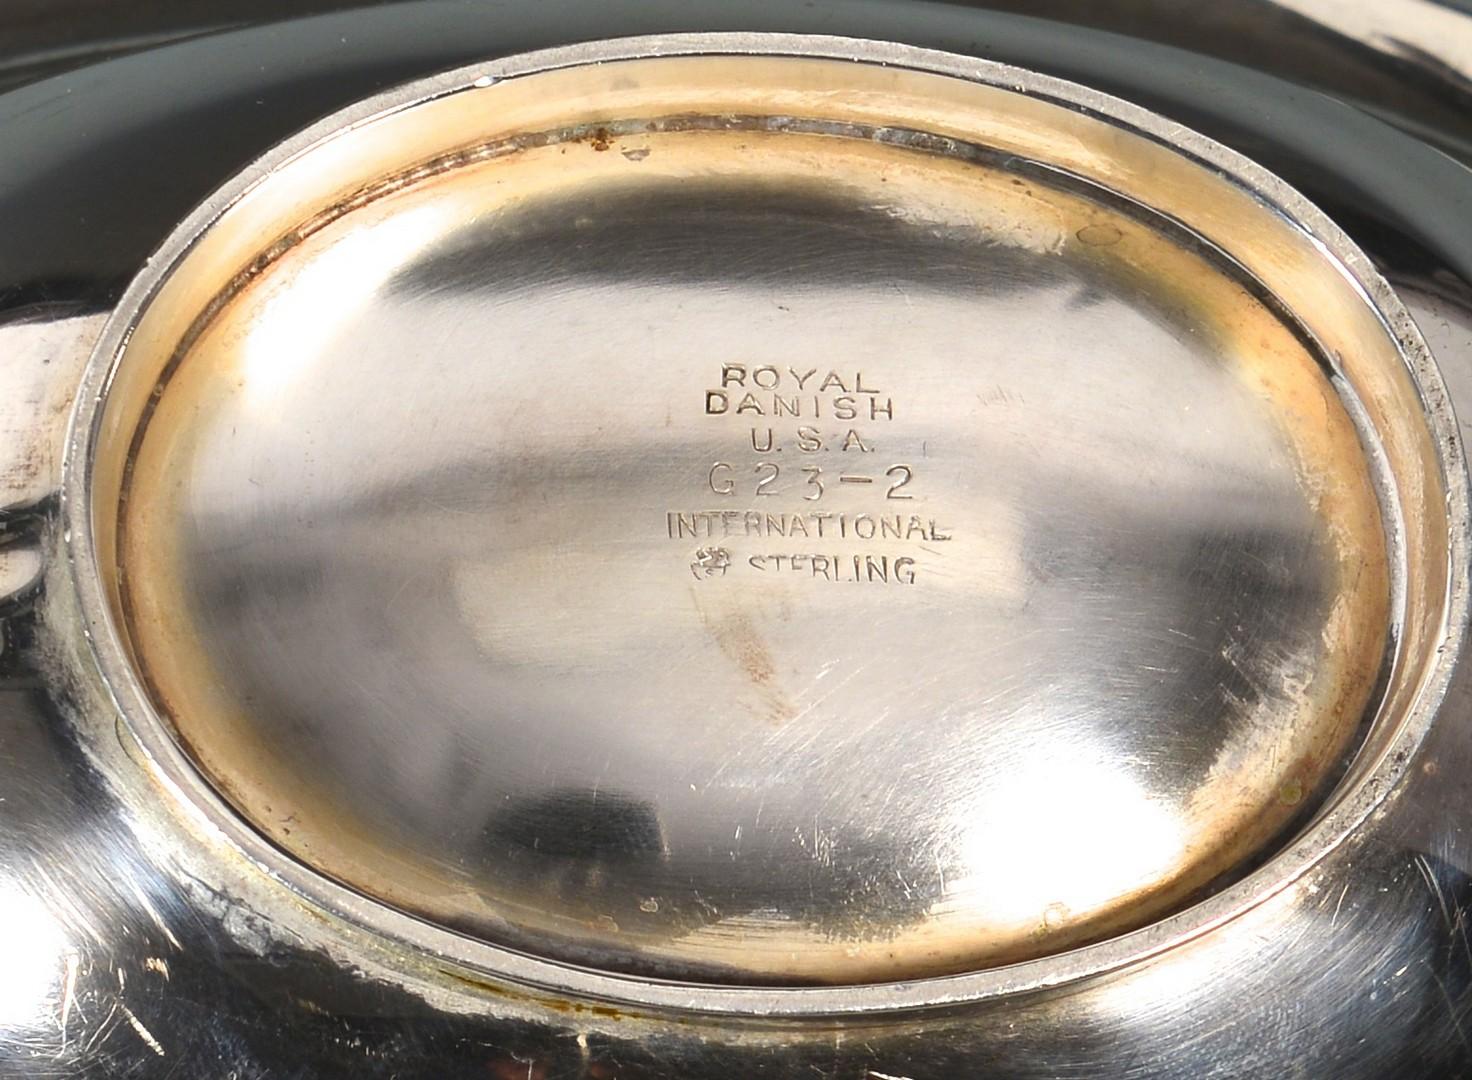 Lot 328: International Sterling Royal Danish Flatware, 69 p